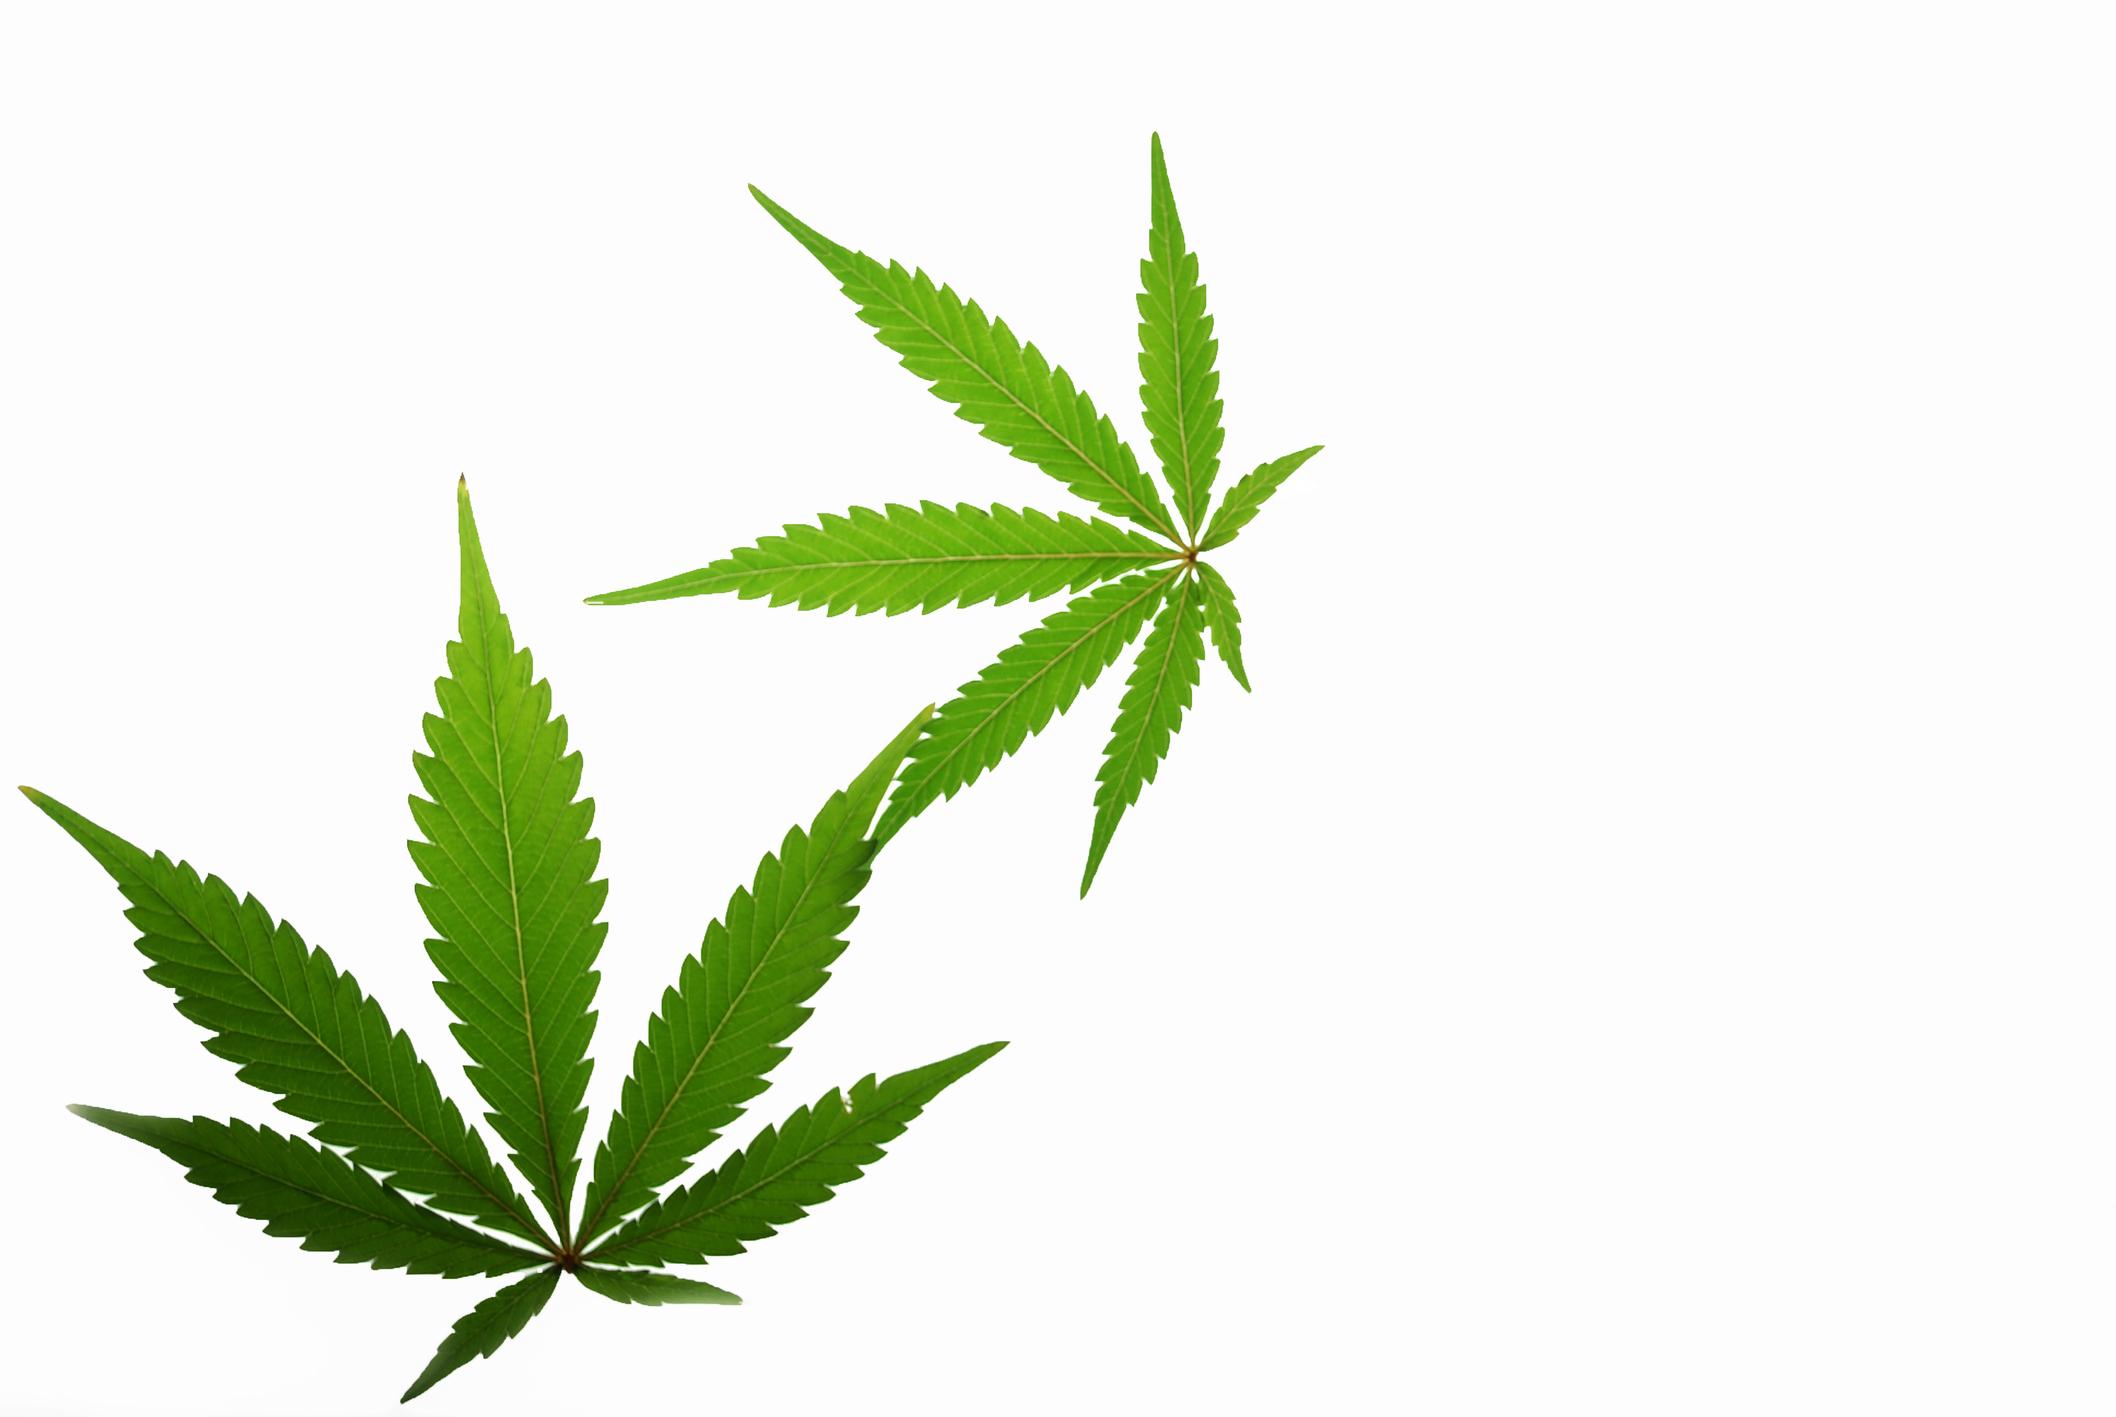 Two marijuana leaves on a white background.